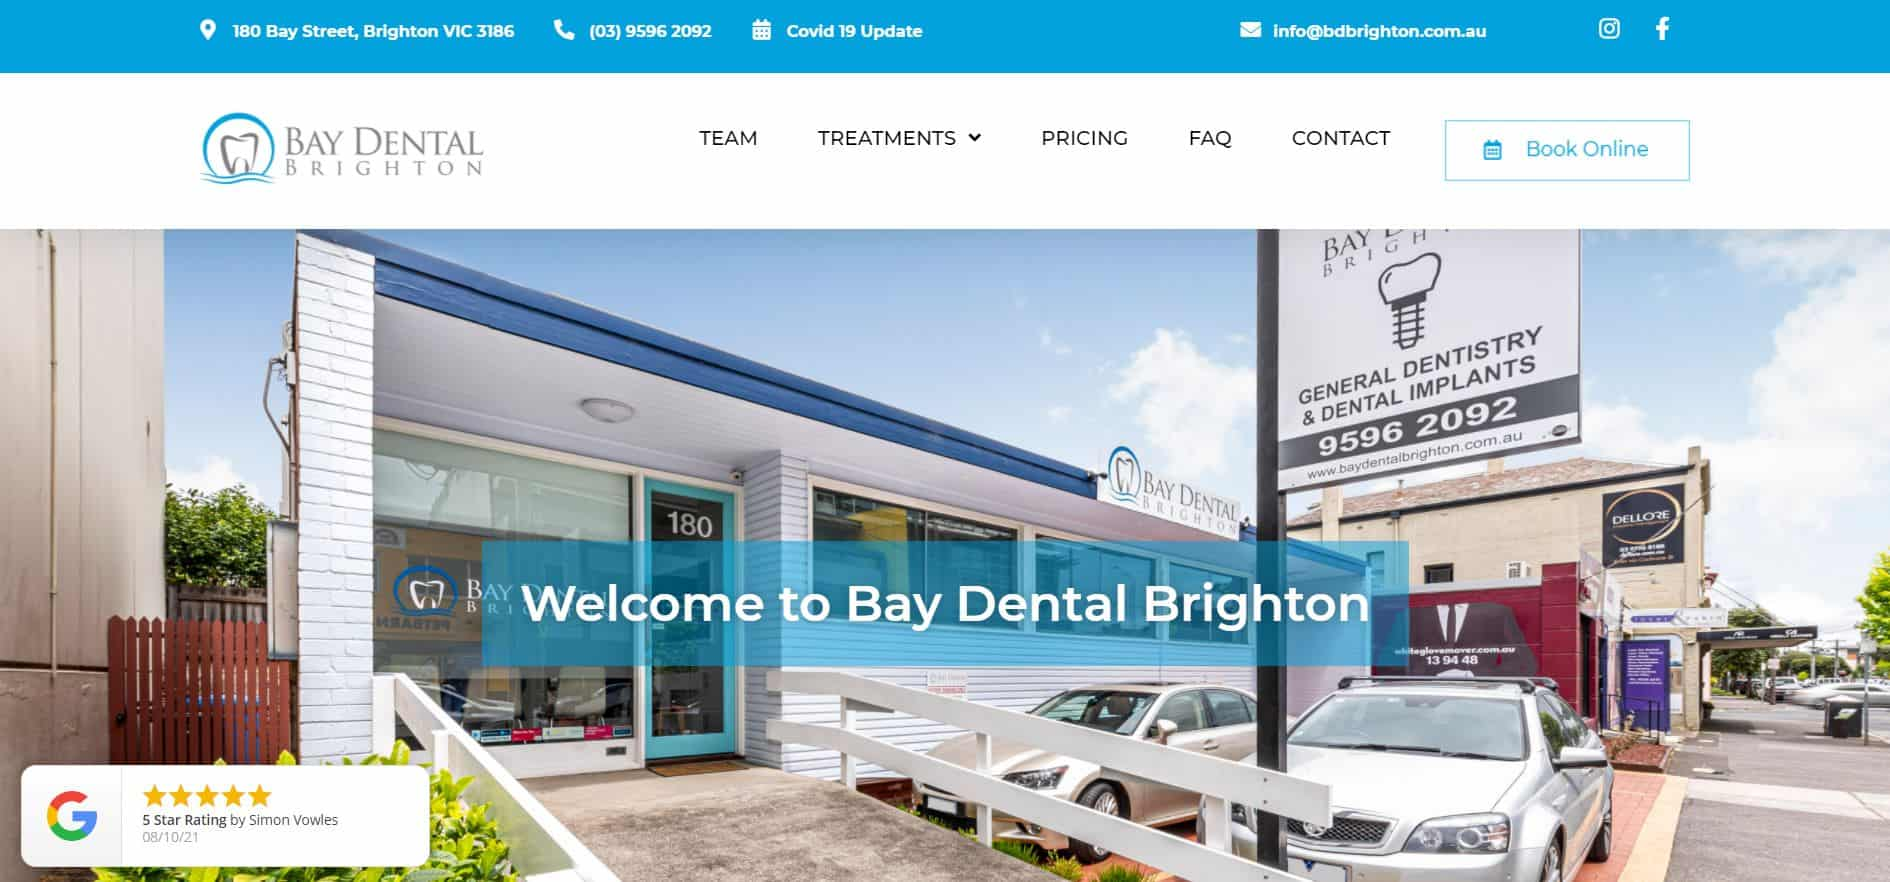 bay dental brighton